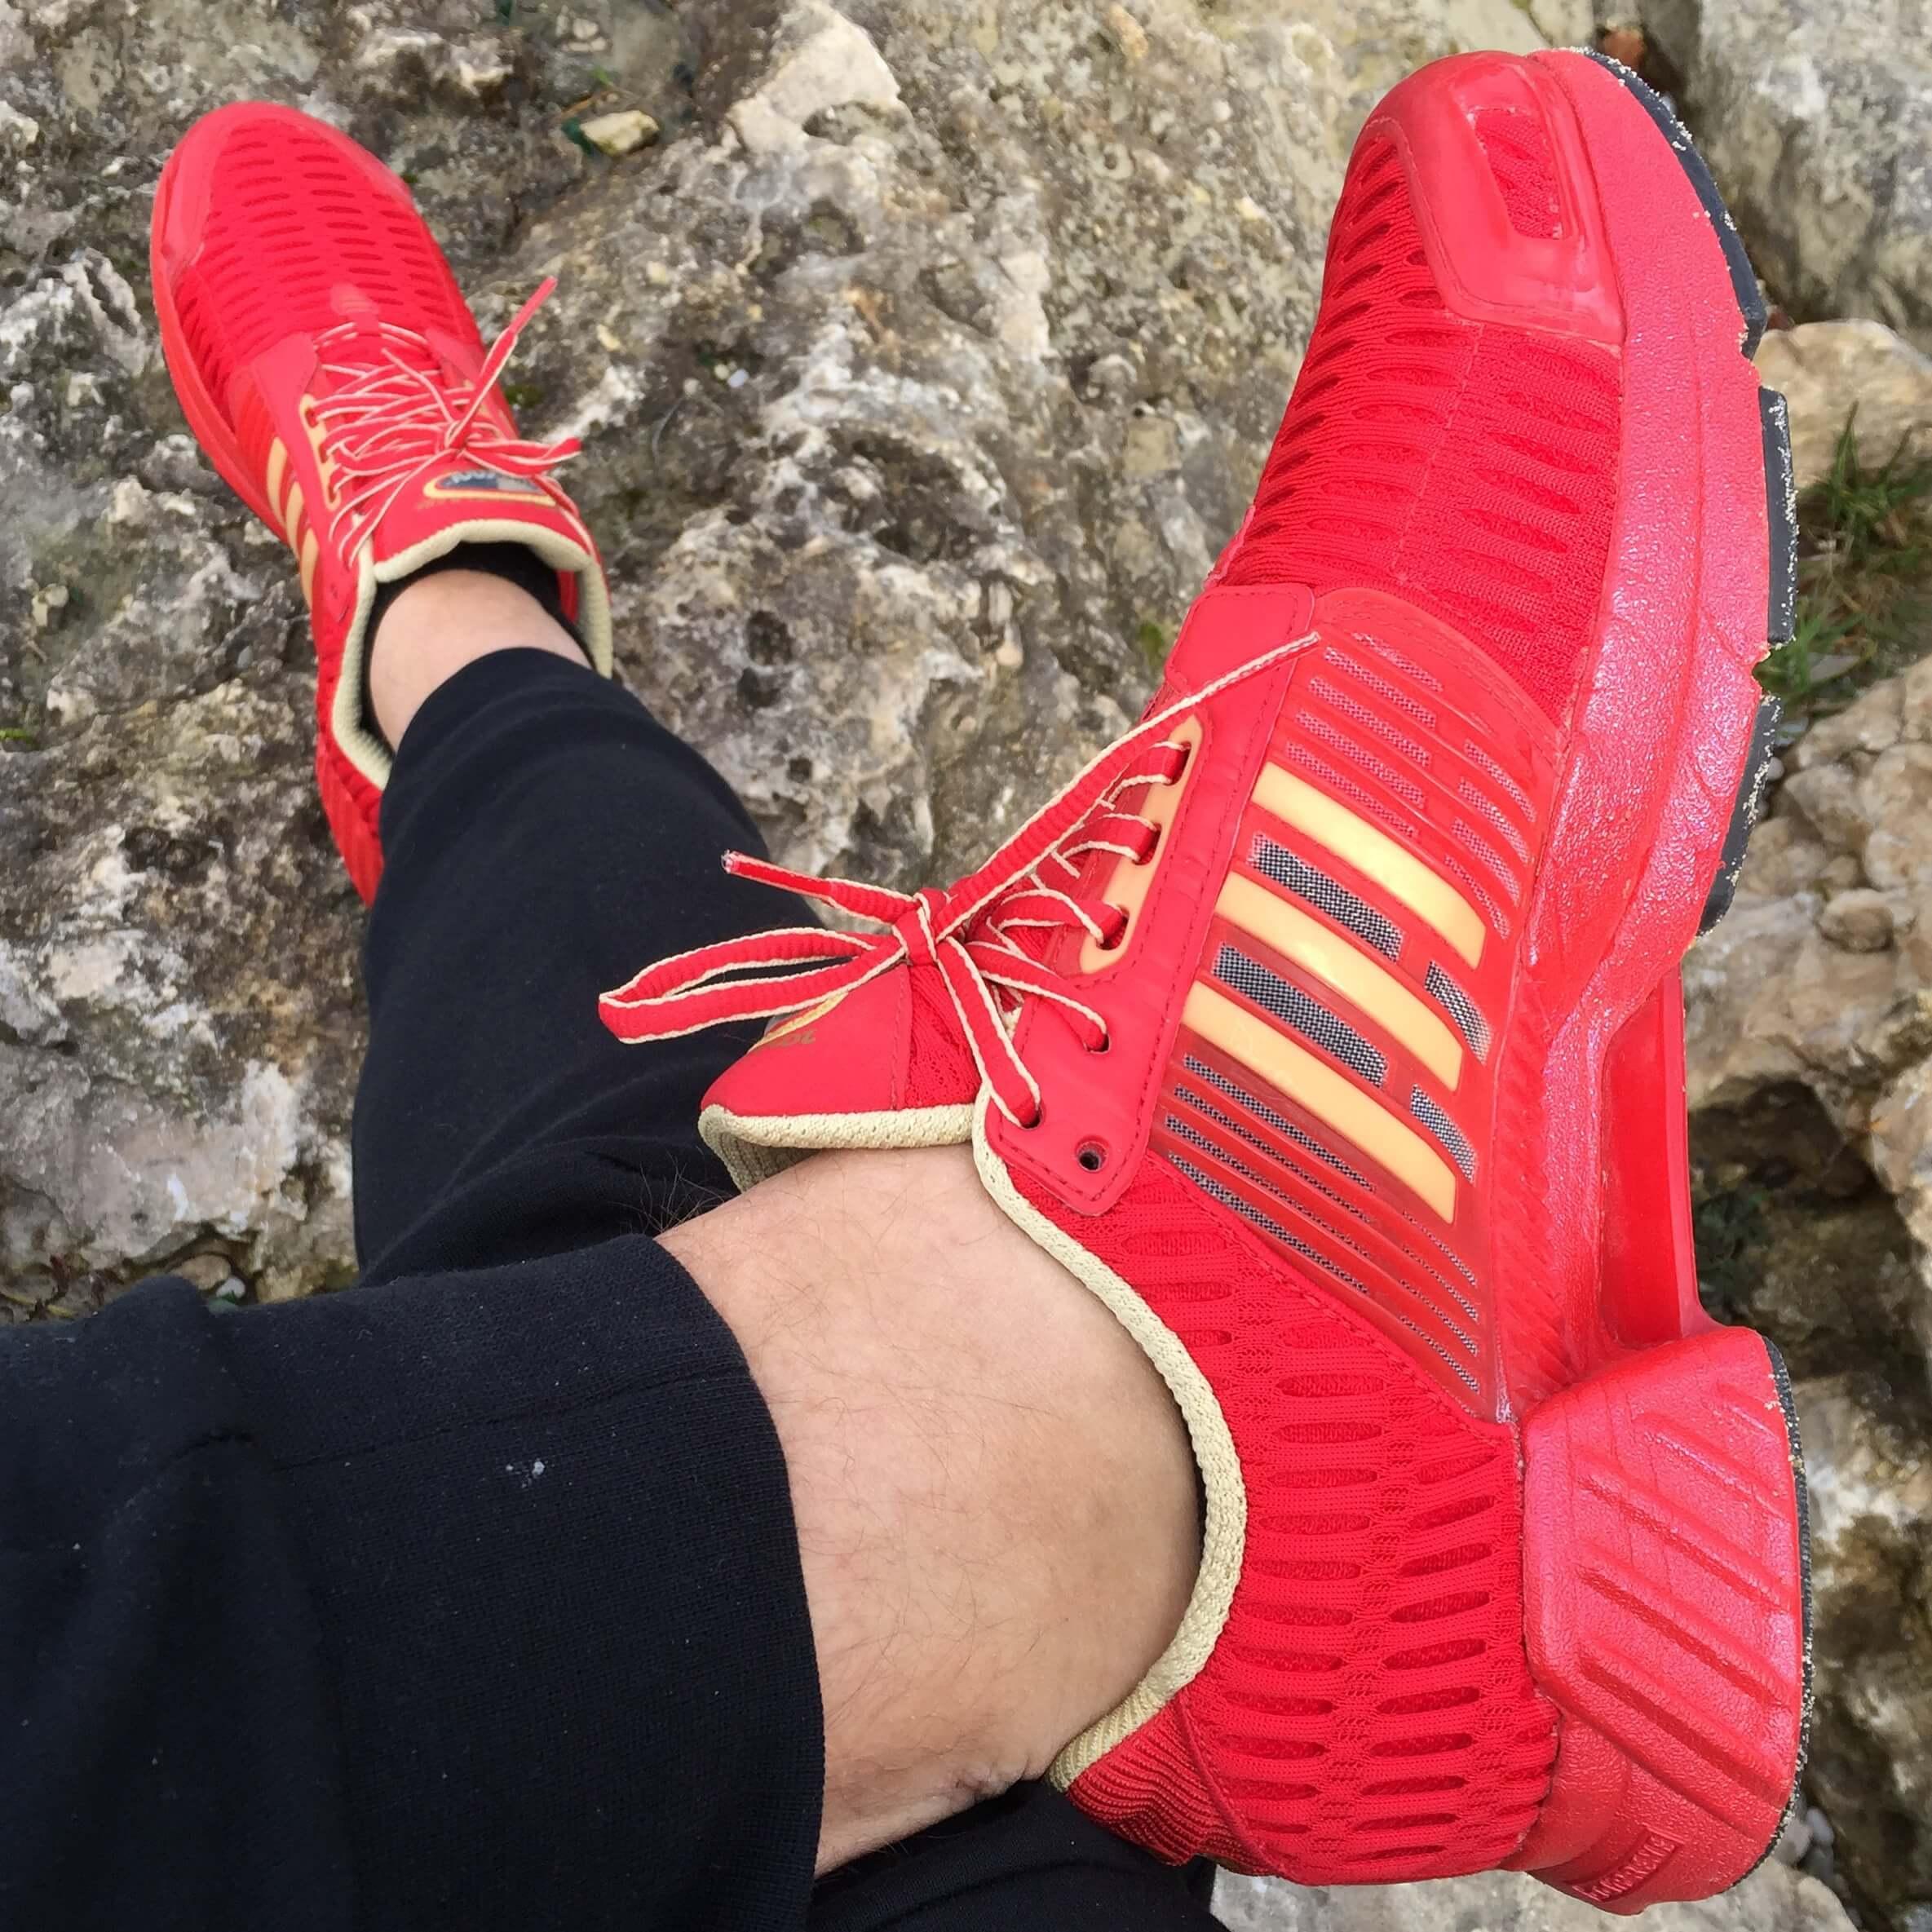 Adidas-ClimaCool-Coca-Cola-Top-View-Benstah-Onfeet